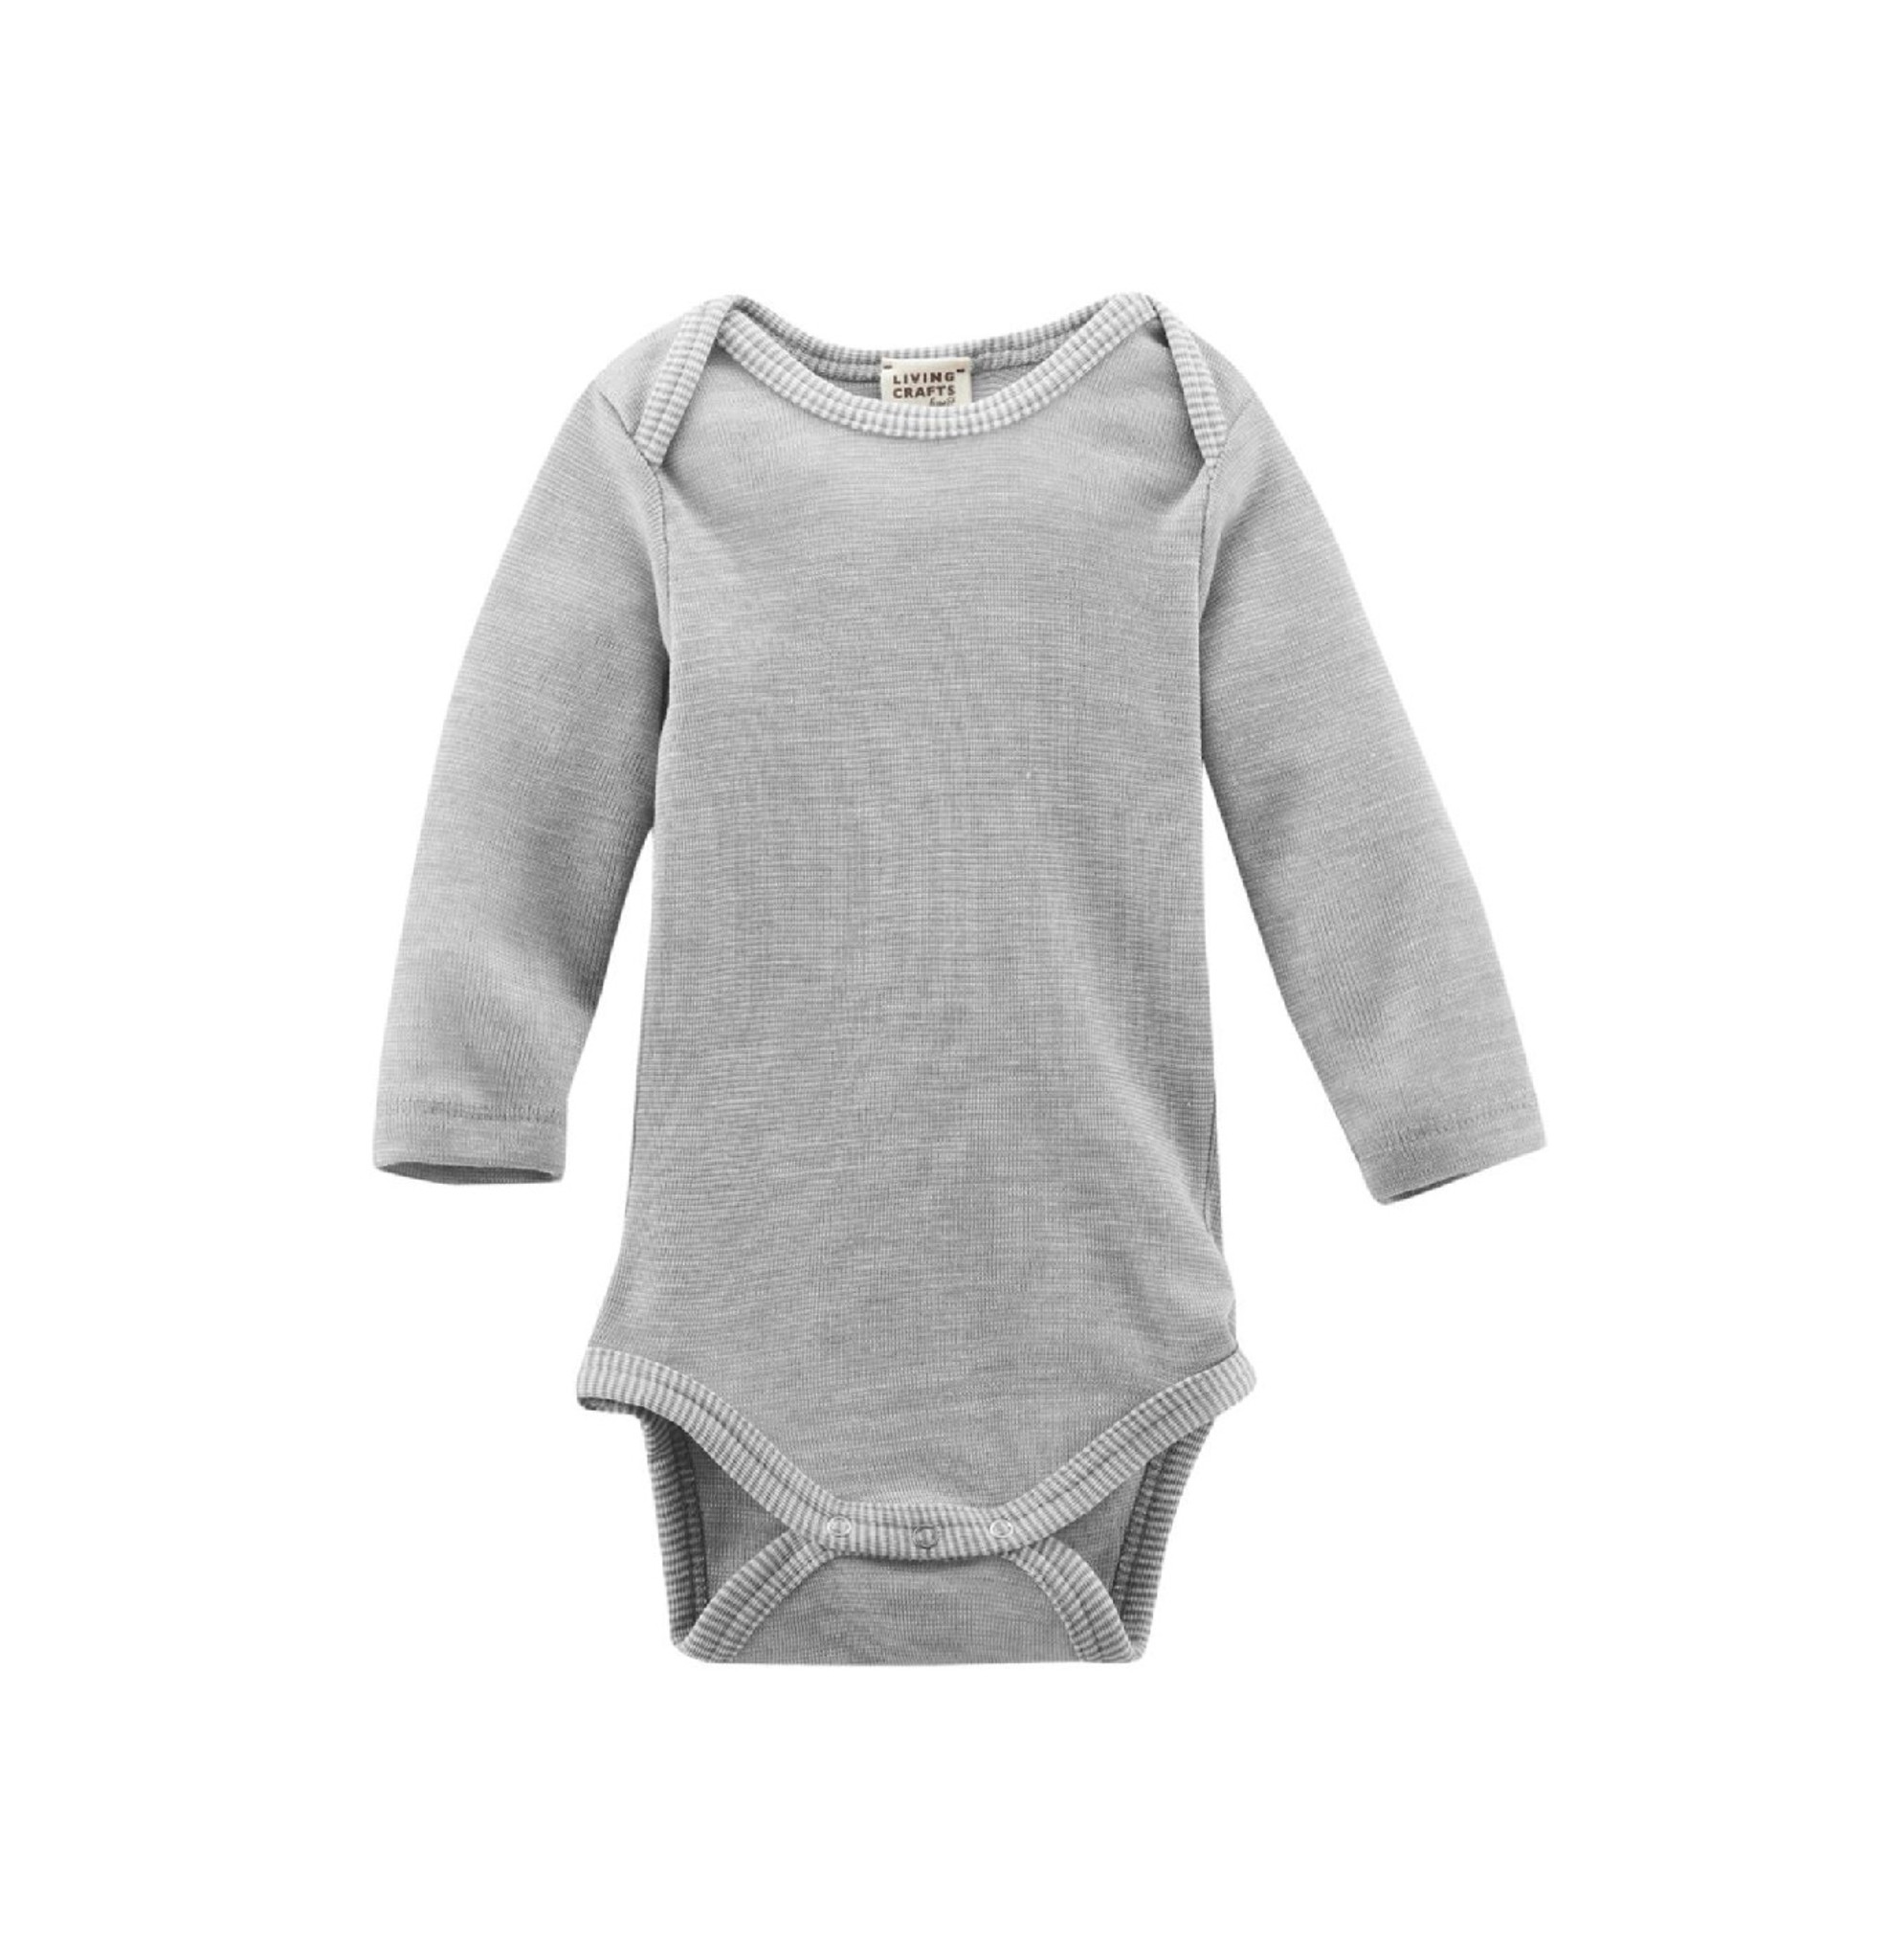 816730aa3 Organic Wool Silk Kids Bodysuit - Little Spruce Organics